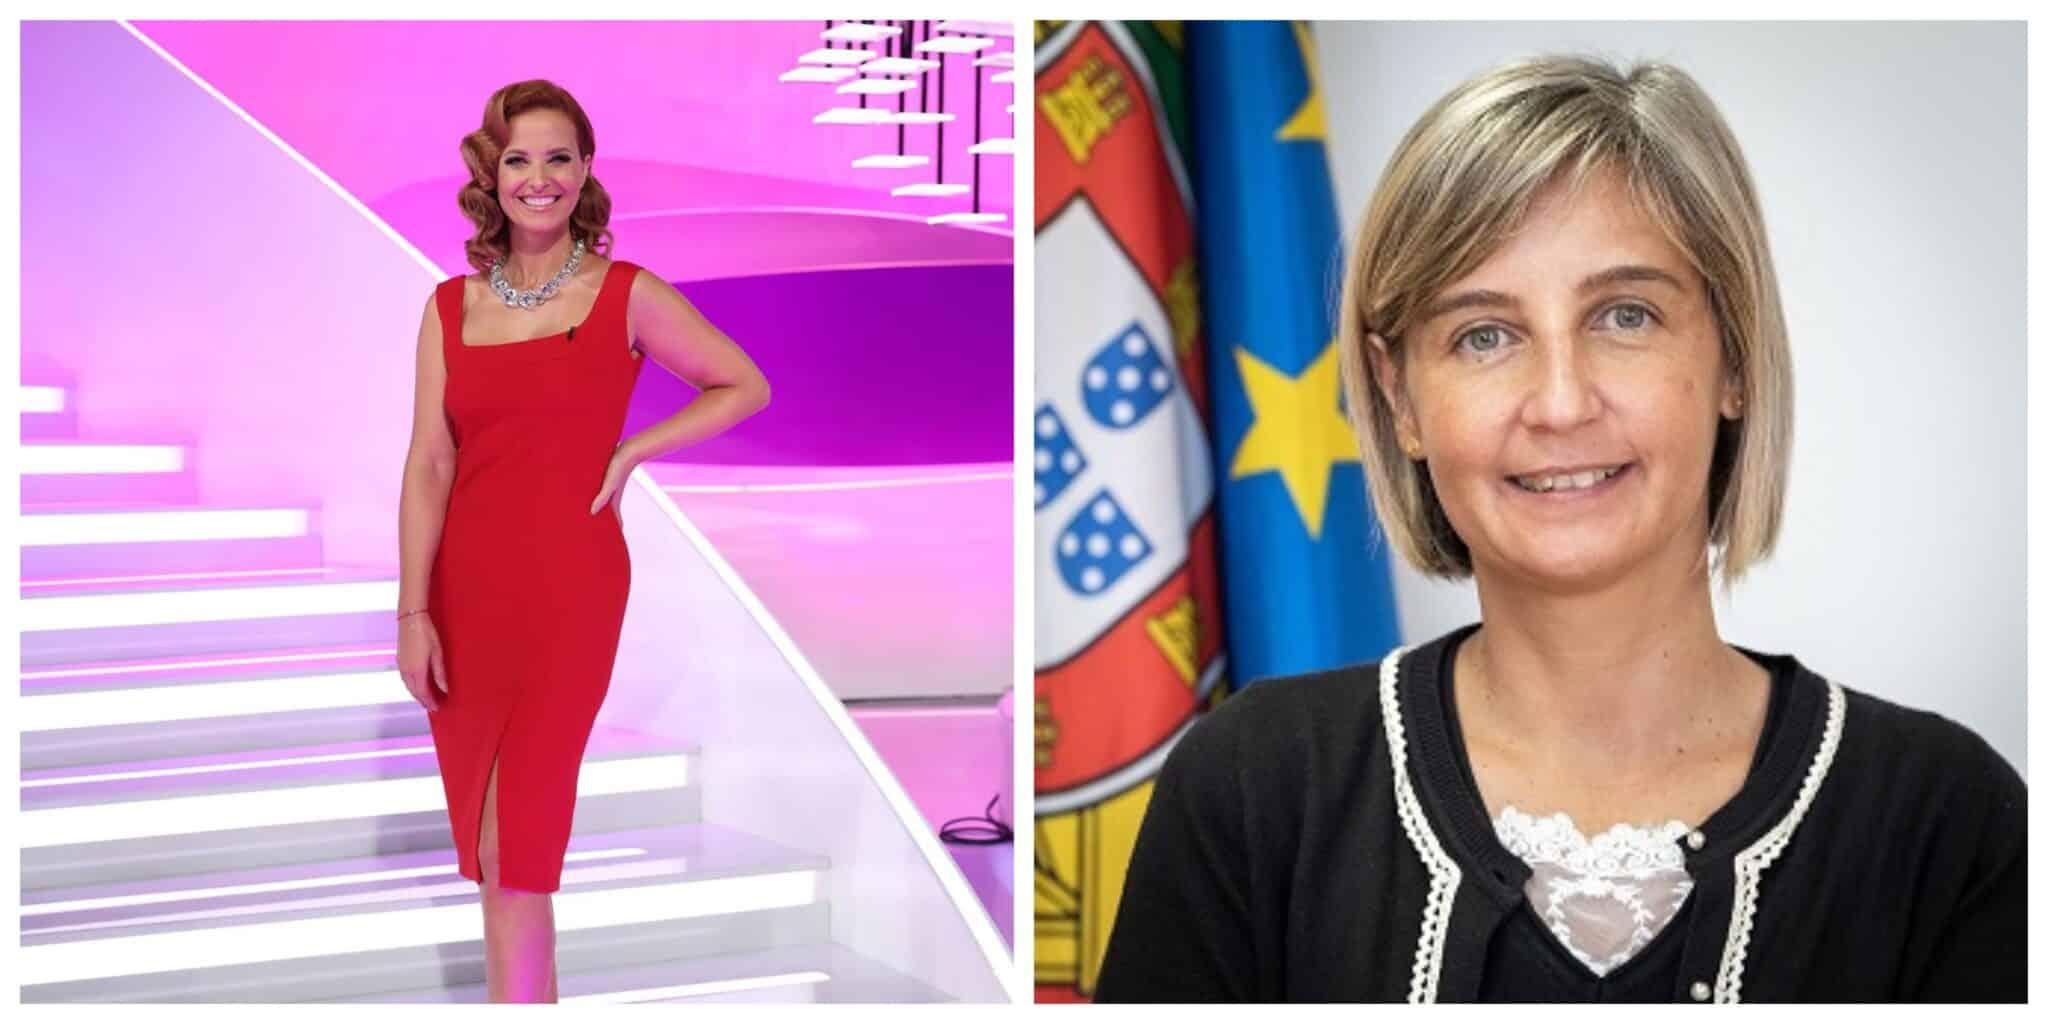 Cristina Ferreira Marta Temido